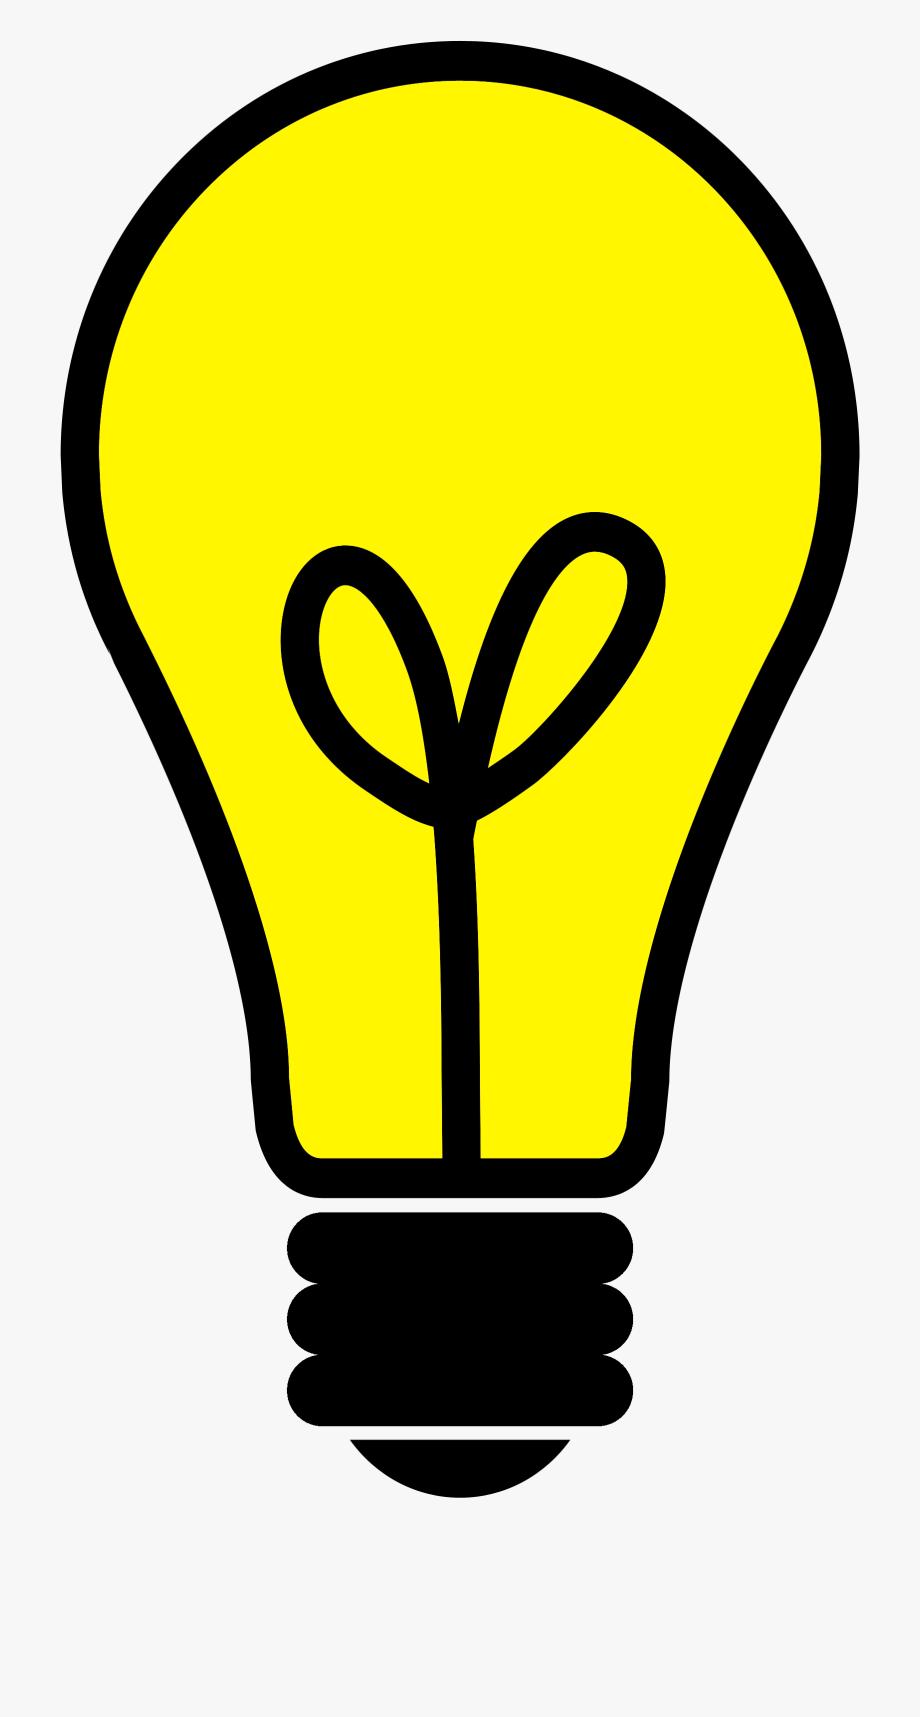 Lightbulb clipart yellow.